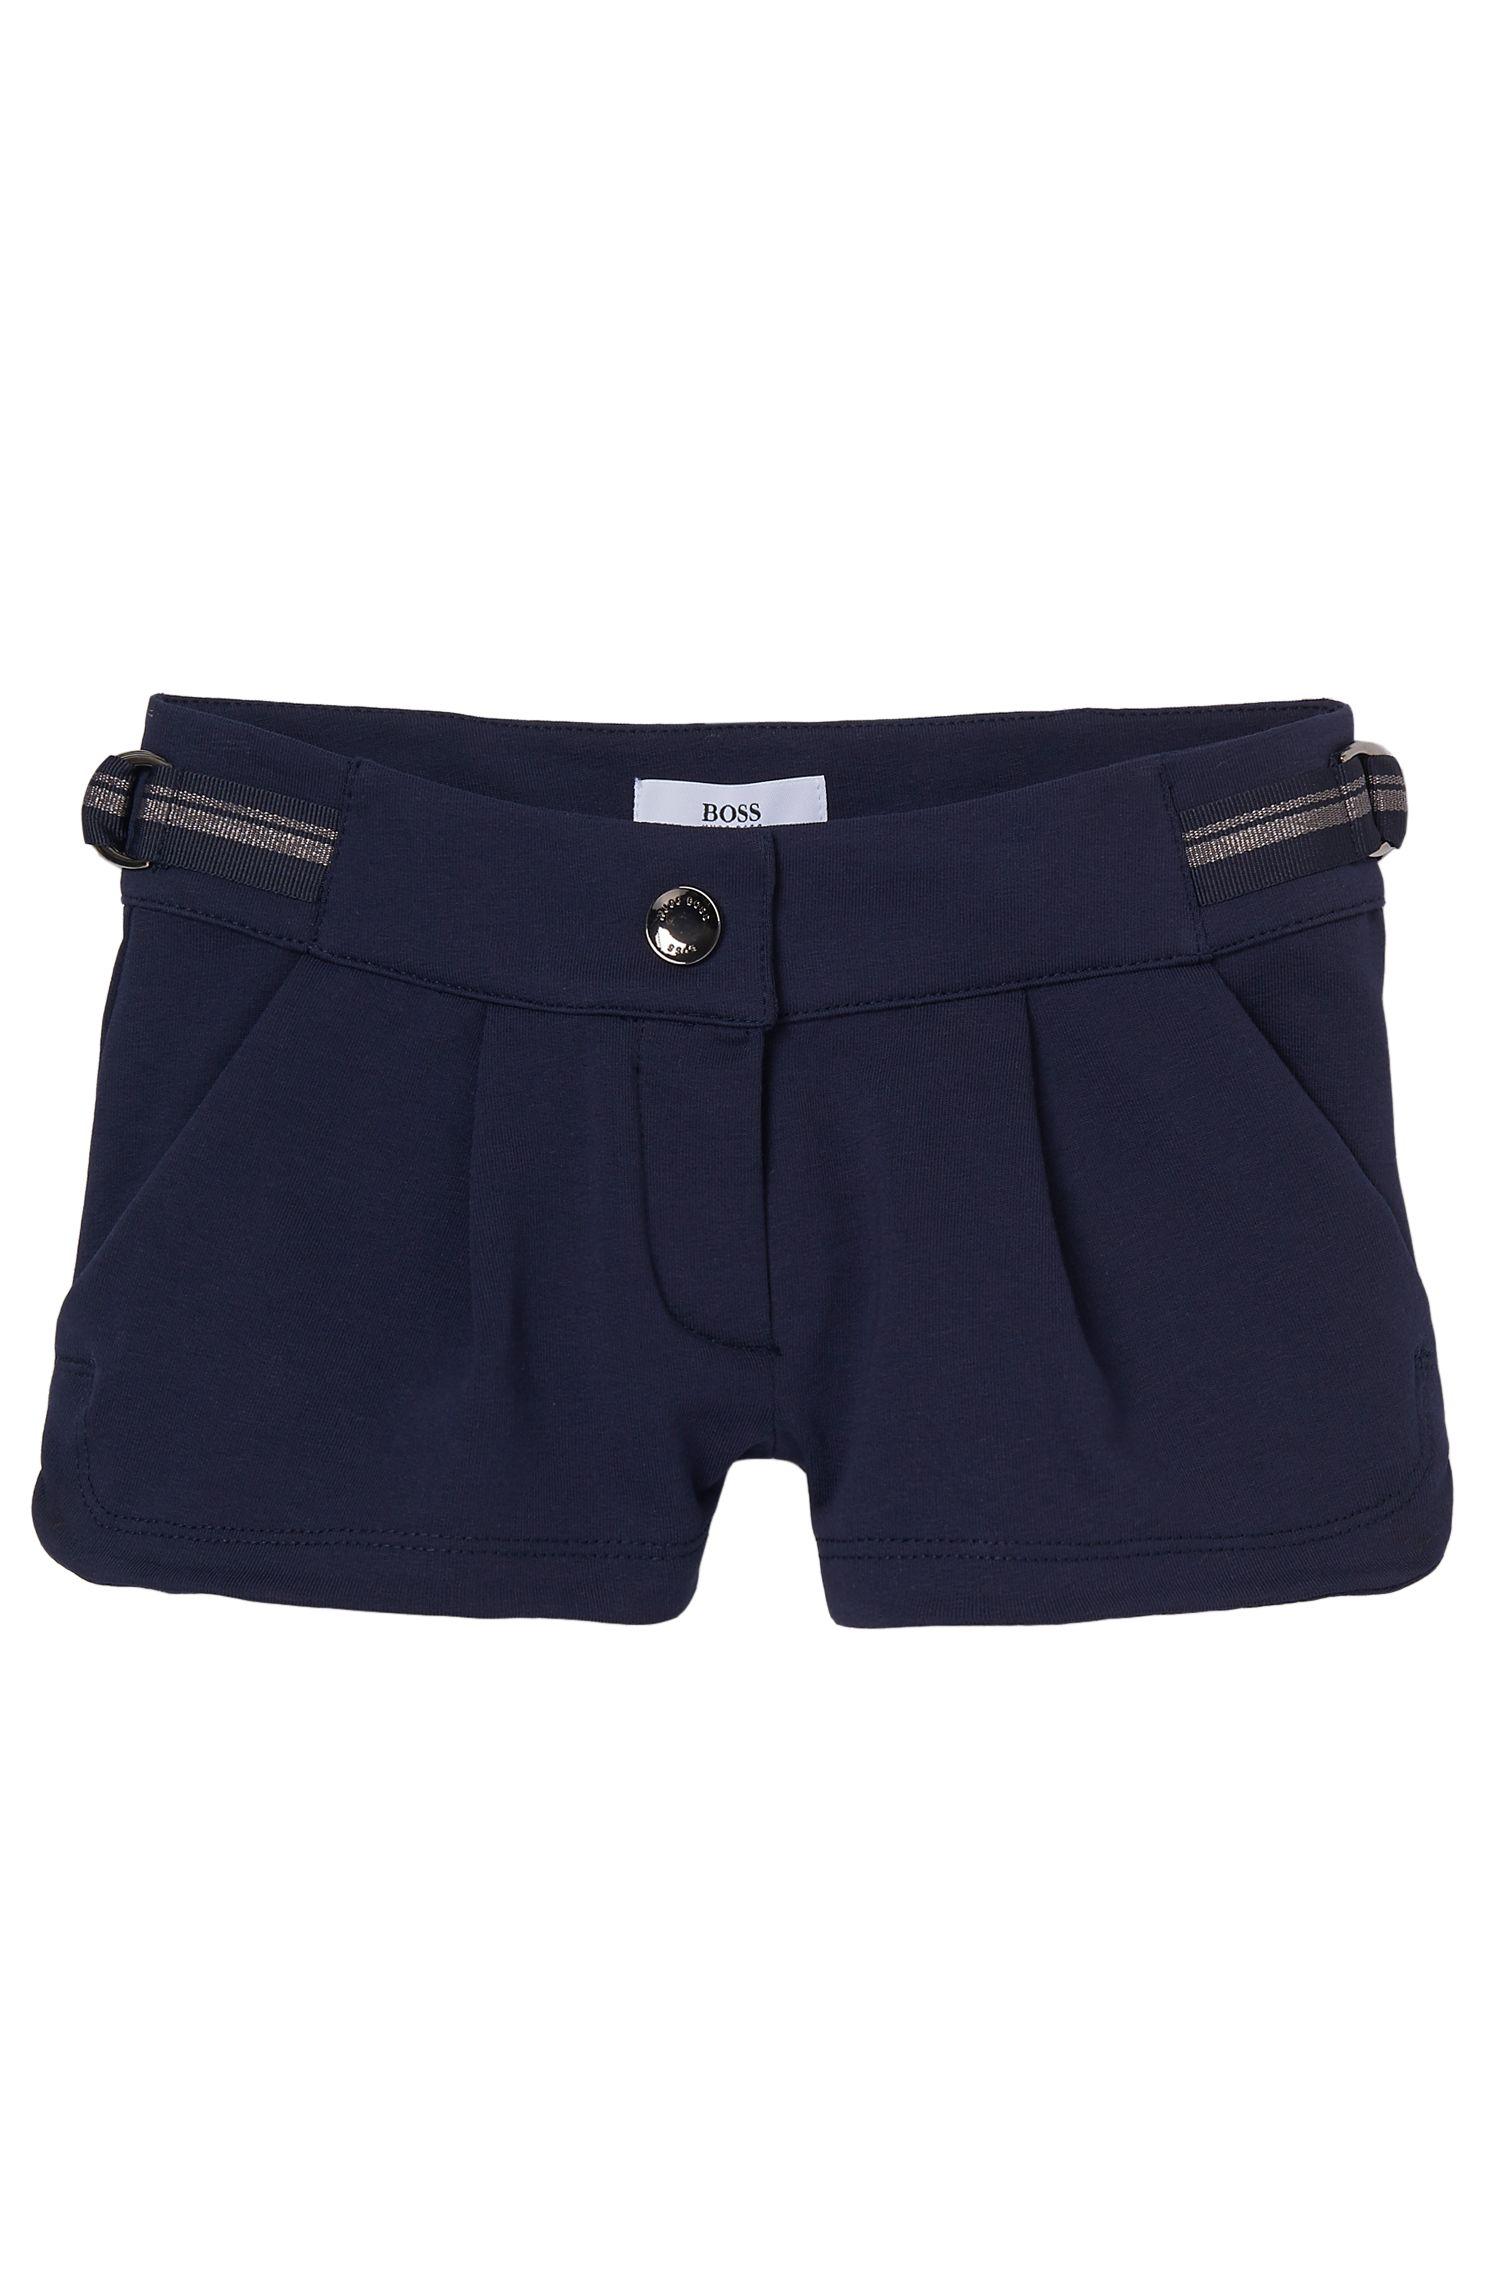 'J14173' | Girls Cotton Fleece Shorts